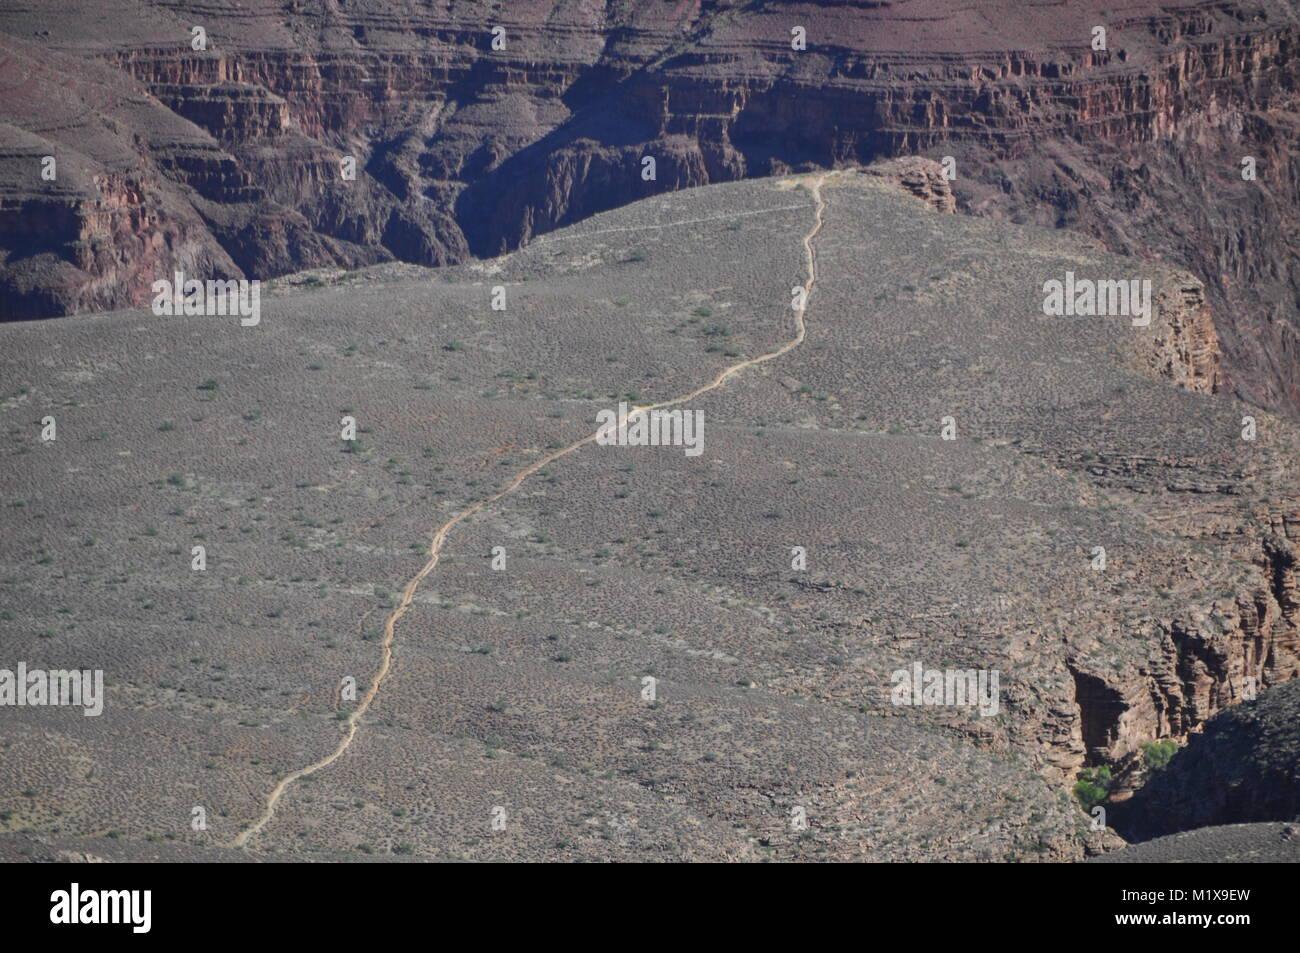 Plateau Point Trail heading towards Plateau Point, Grand Canyon National Park, Arizona, USA - Stock Image